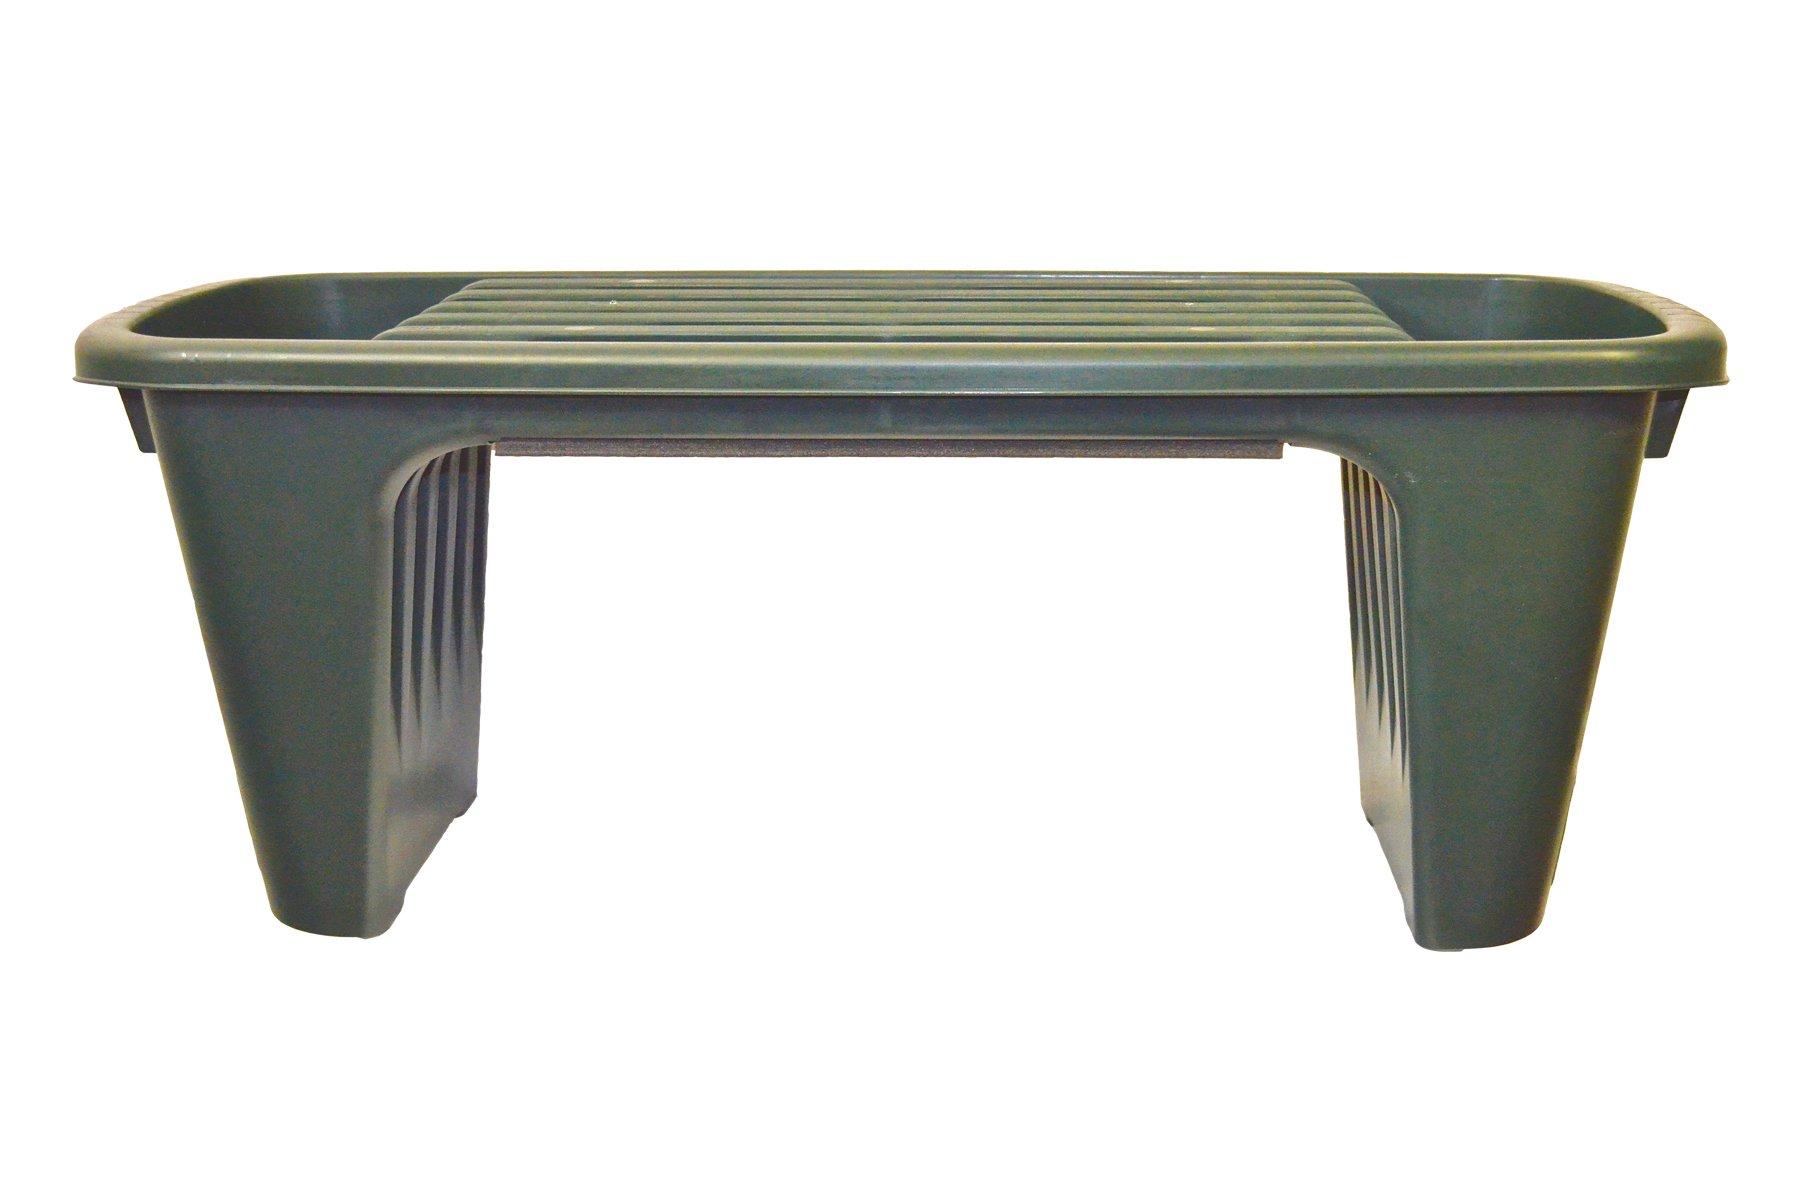 Bosmere N468 Plastic Kneeler Seat for Gardening